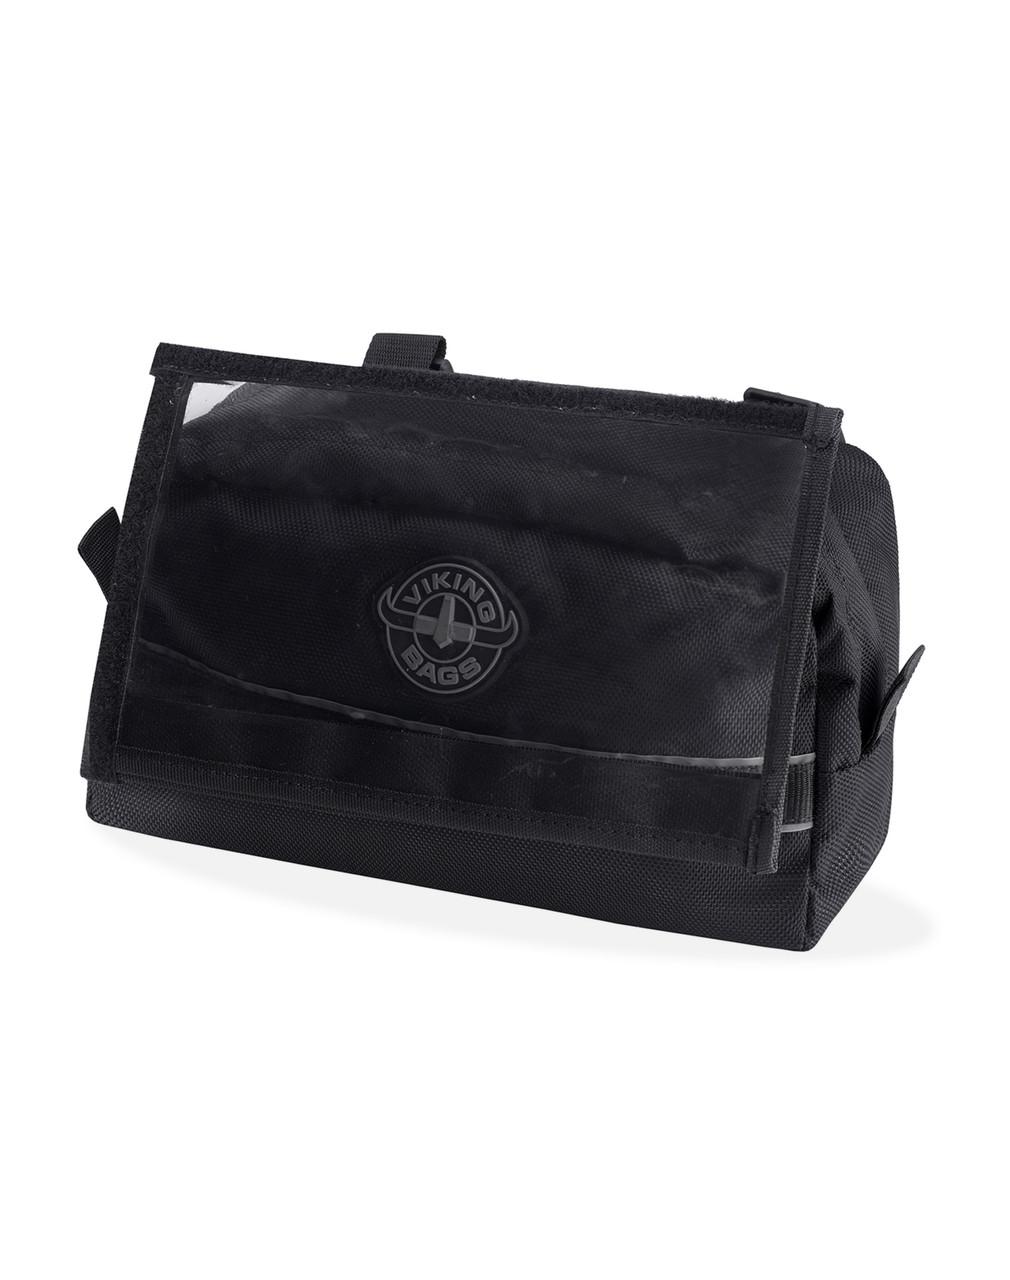 Viking Small Black Dirt Bike/Enduro Handleber Bag Main View